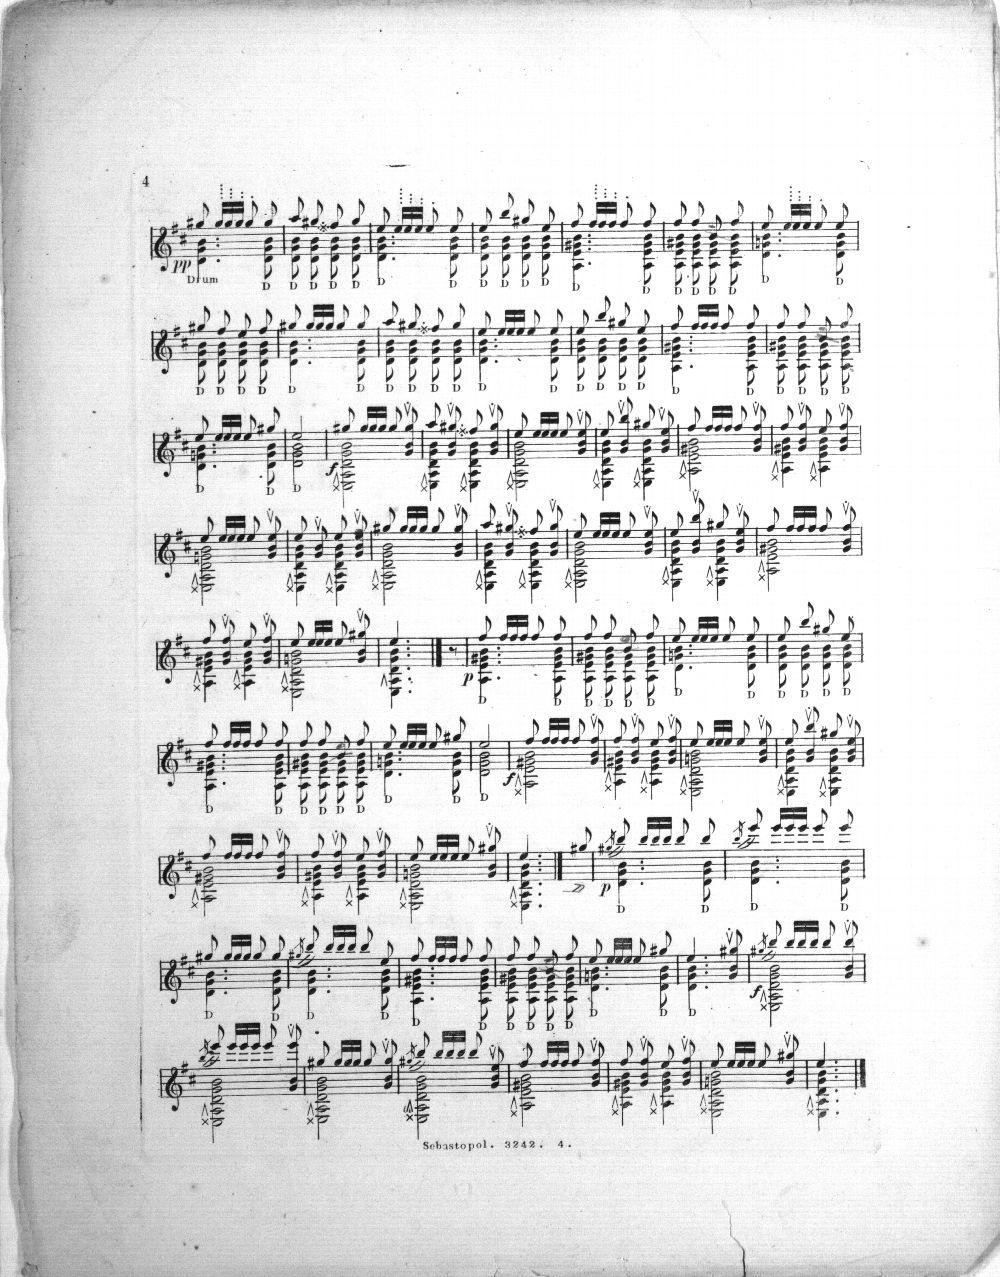 Sebastopol. A descriptive fantaisie for the guitar, by Henry Worrall - 3